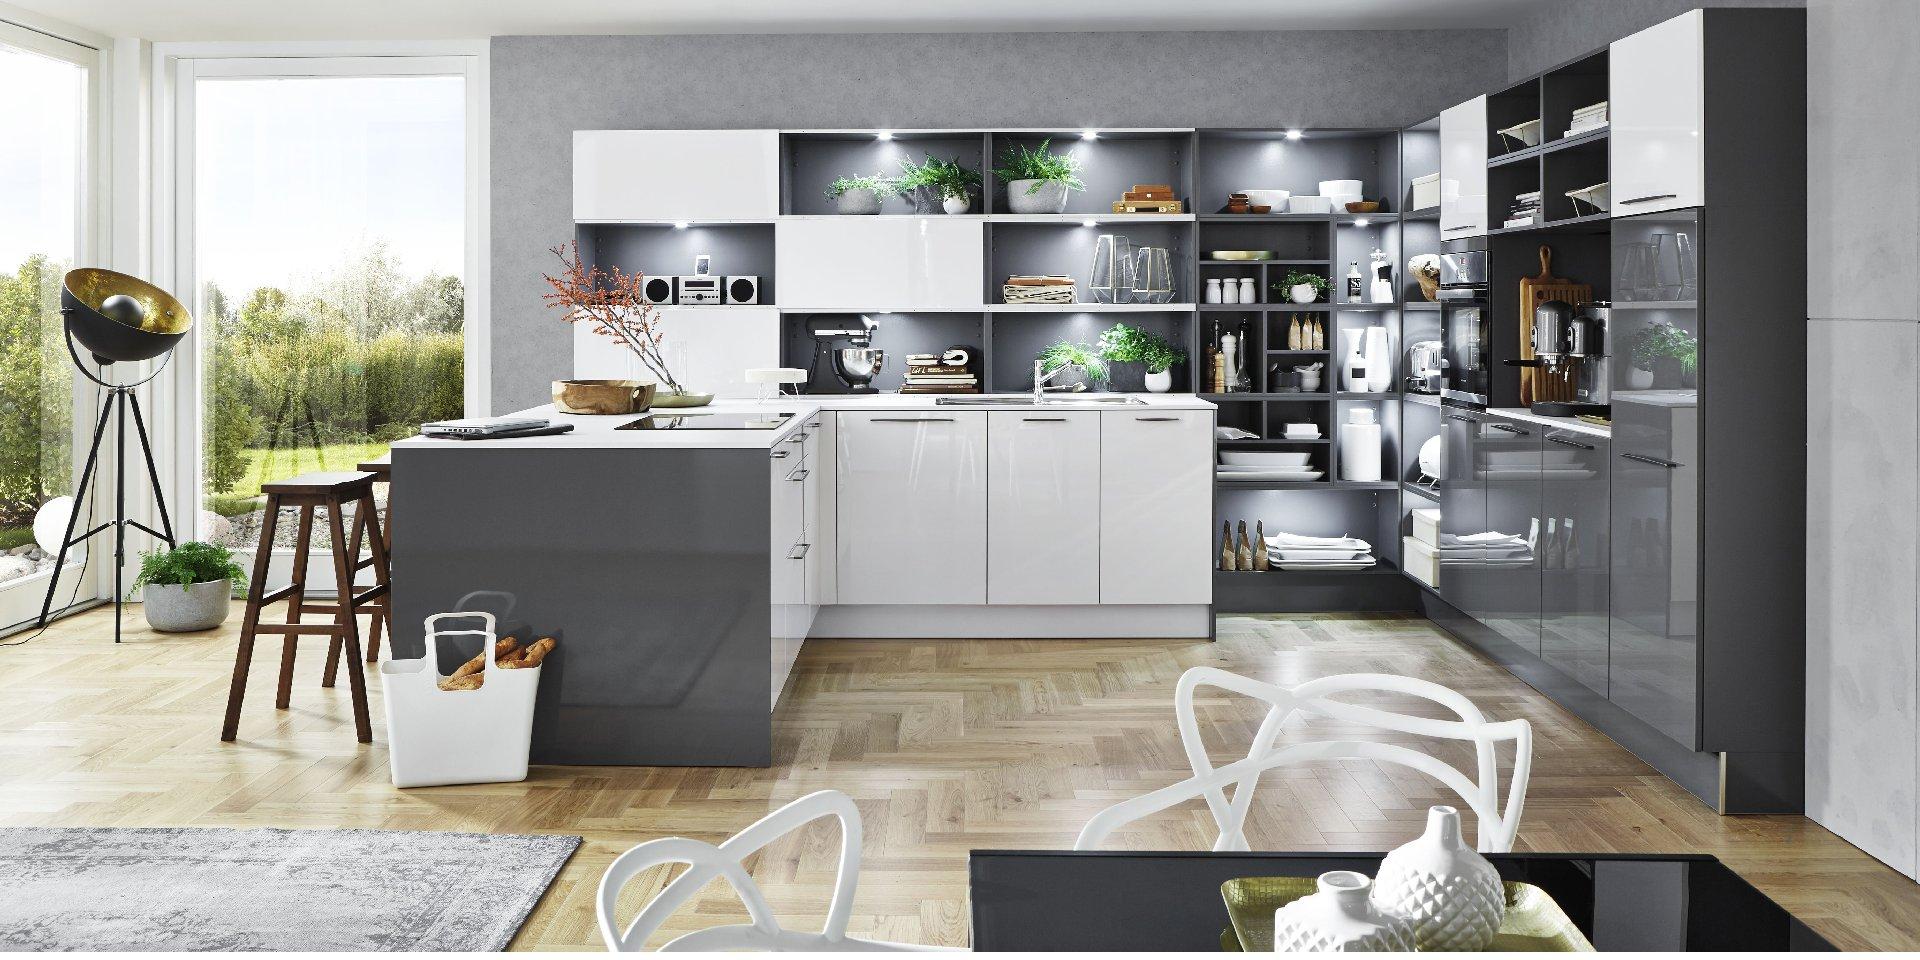 leicht gmbh co kg home. Black Bedroom Furniture Sets. Home Design Ideas